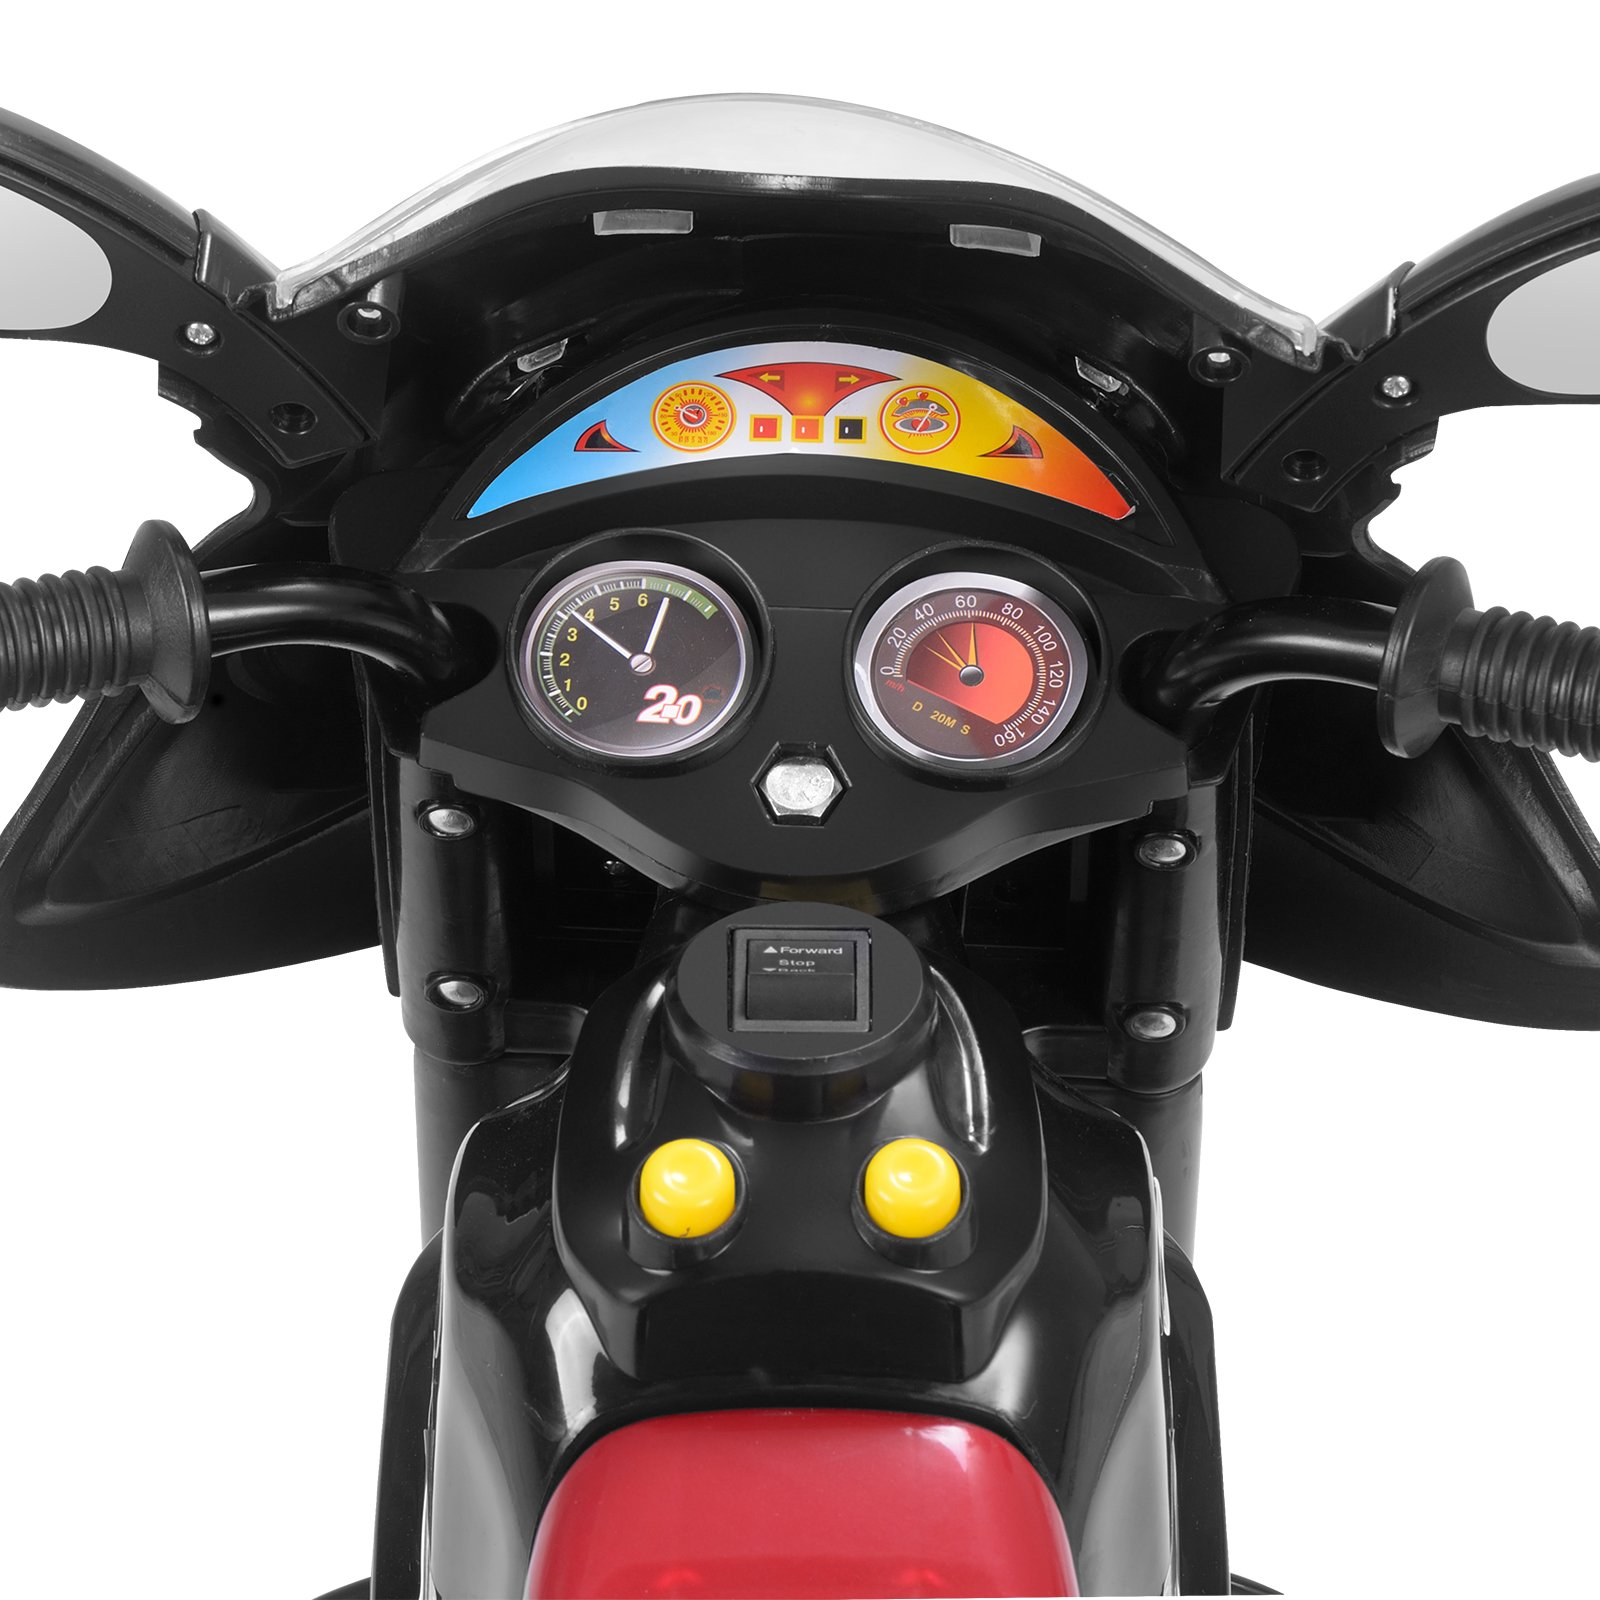 Uenjoy Murtisol Kids Ride on Motorcycle 6V Electric Motorcycle 2 Wheels Black by Uenjoy (Image #6)